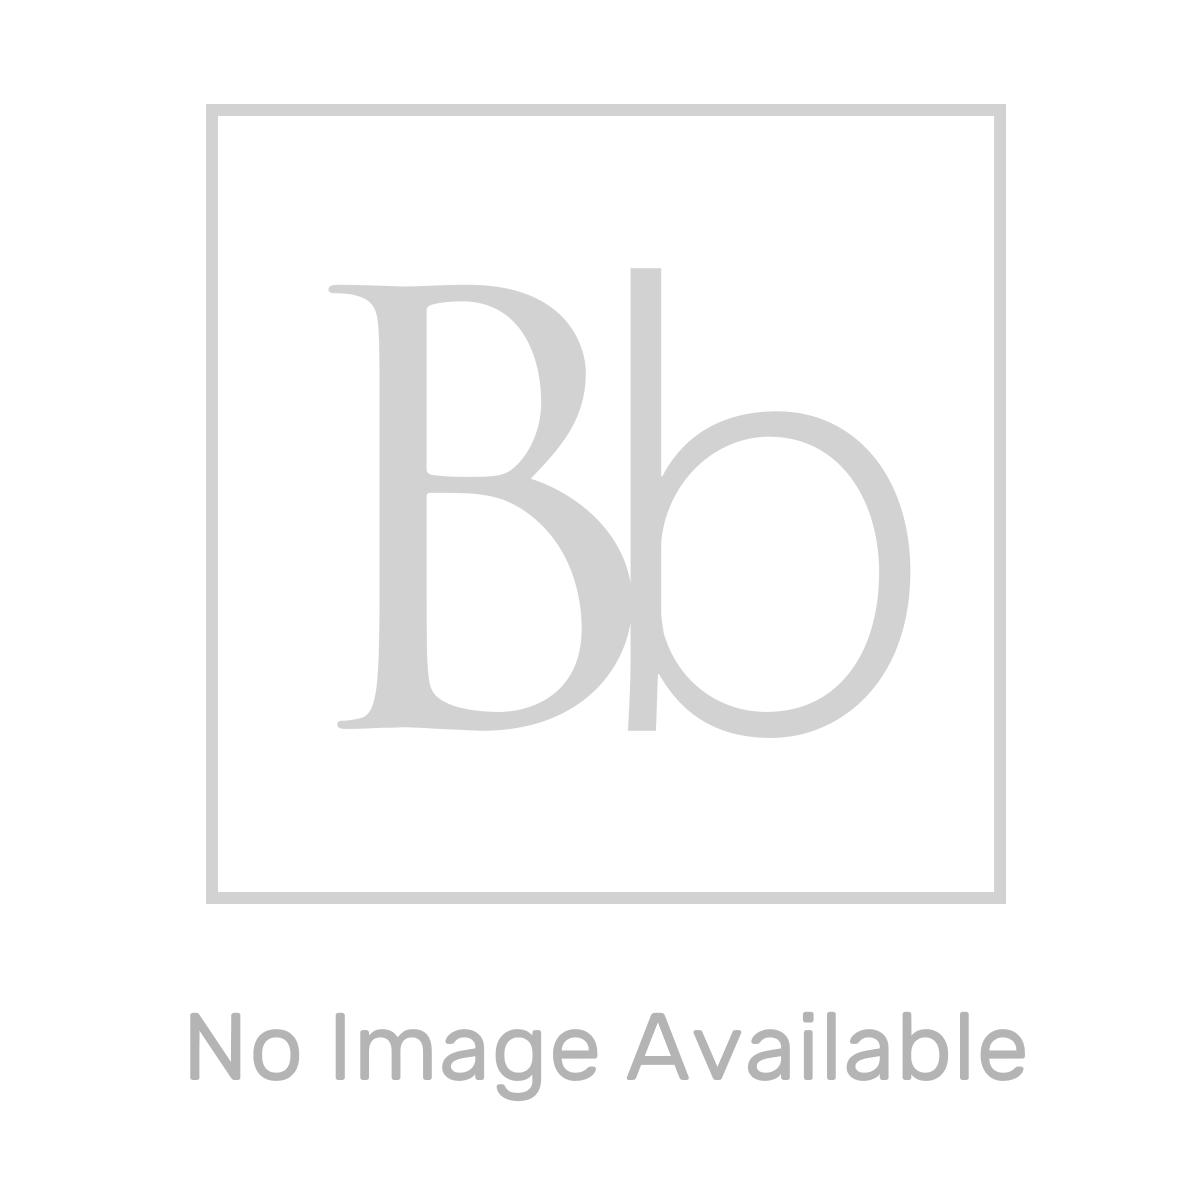 RAK Surface Mid Grey Rustic Tile 600 x 600mm Lifestyle